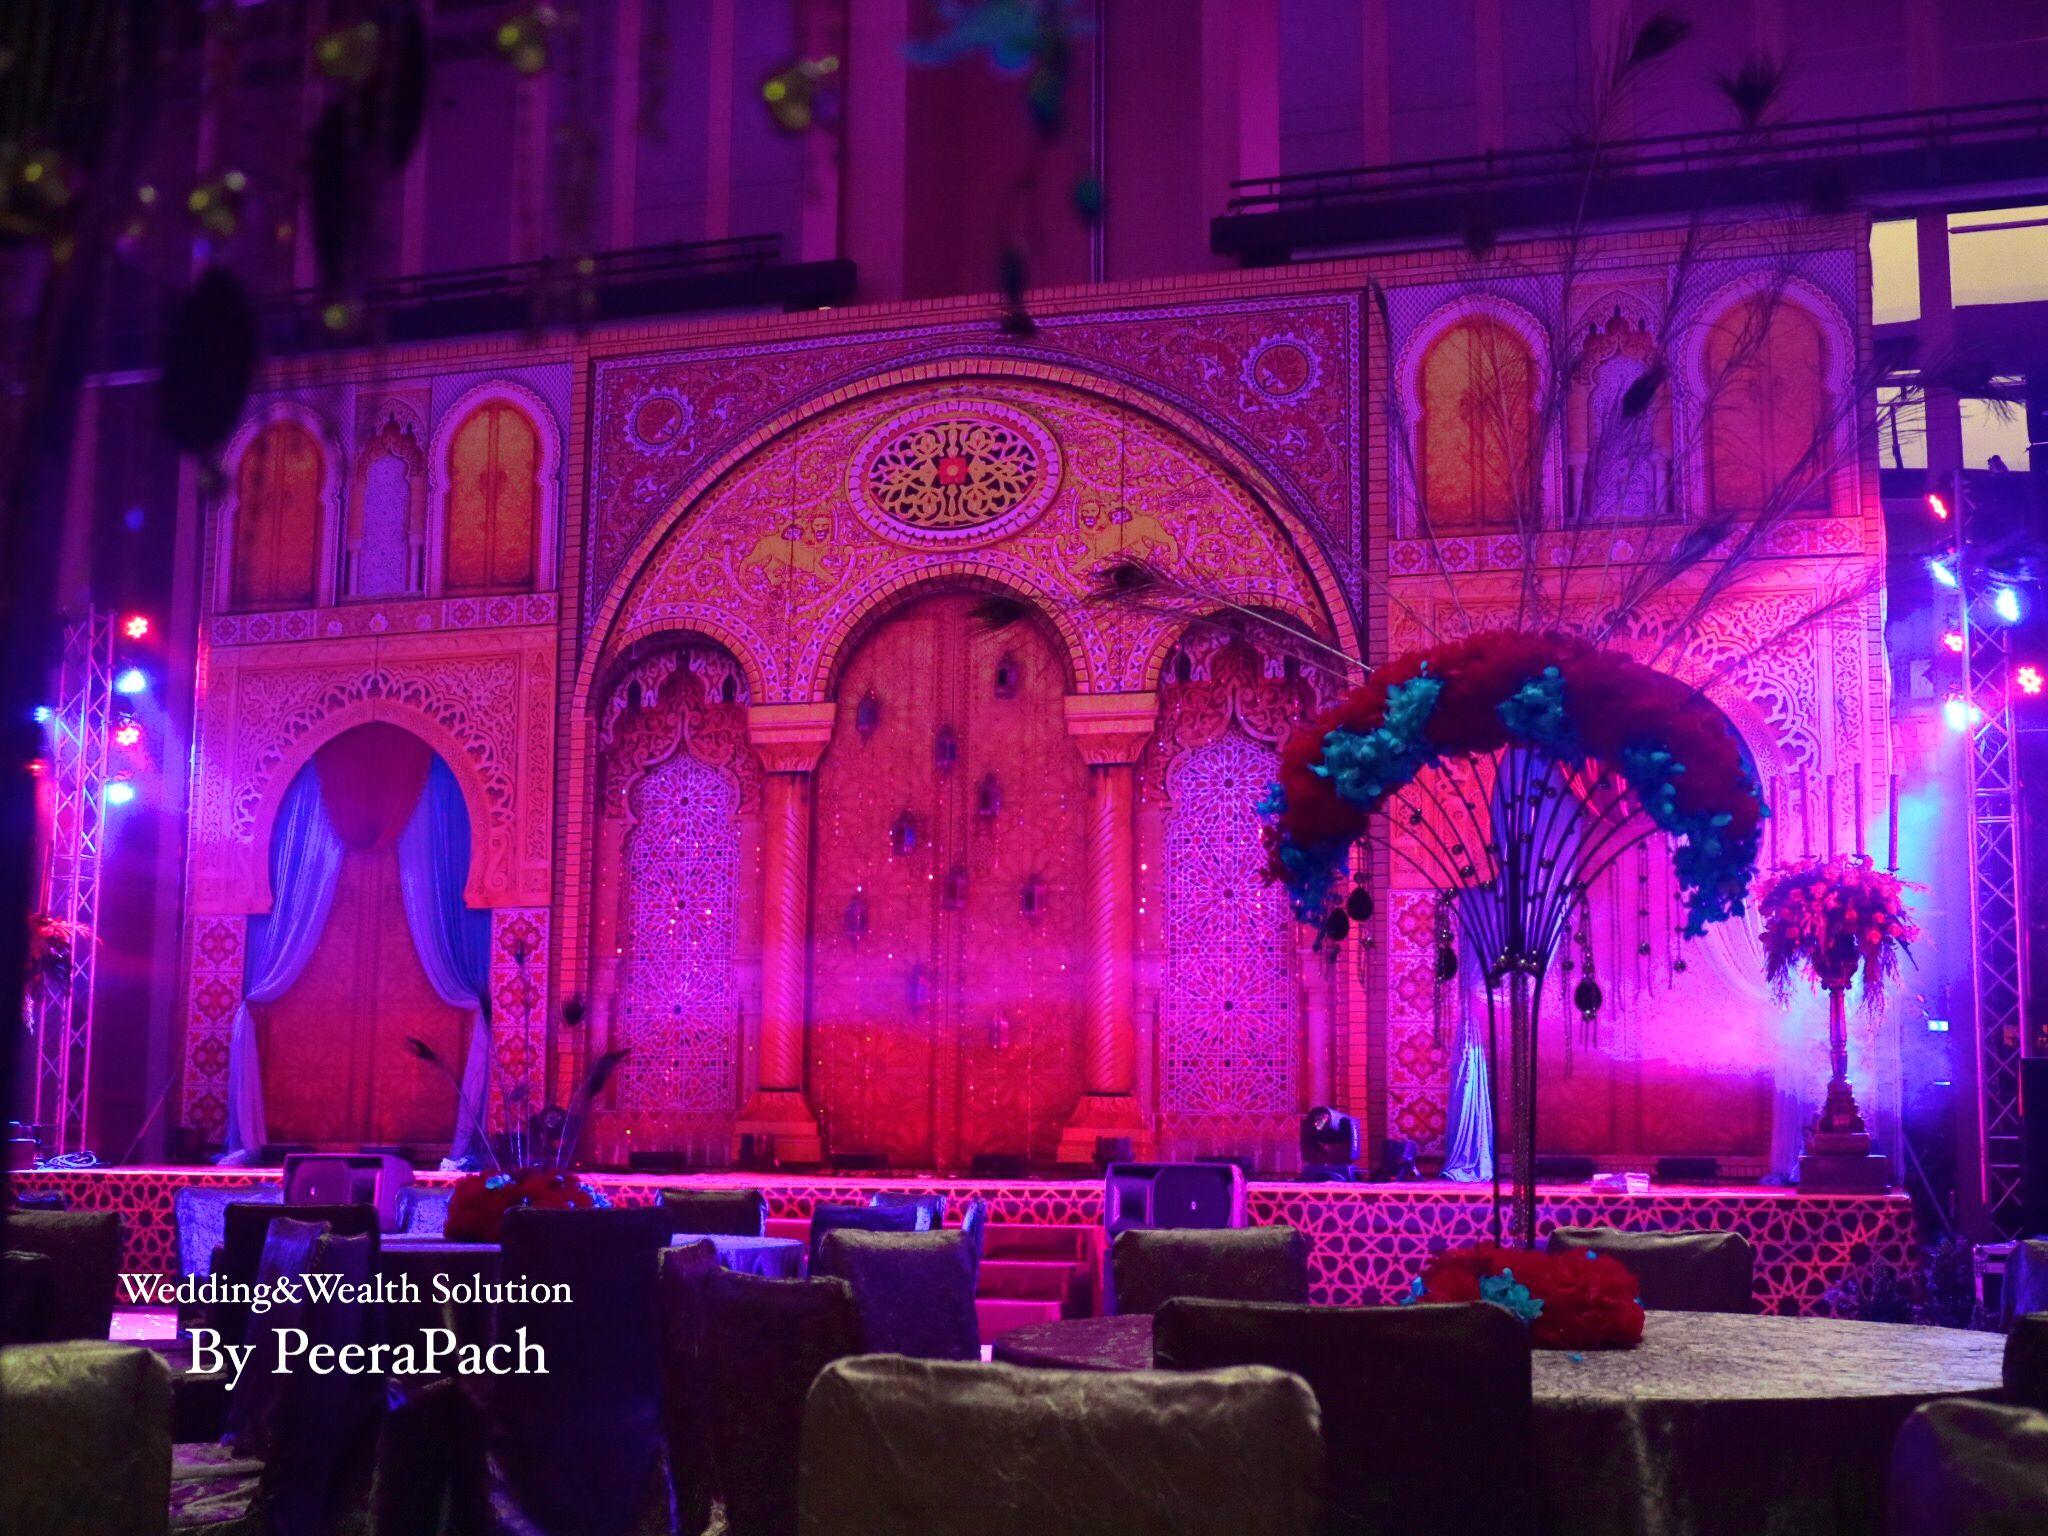 Rajasthani wedding stage decoration  Pin by WeddinguWealth Solution By PeeraPach on Sangeet Decor  Pinterest